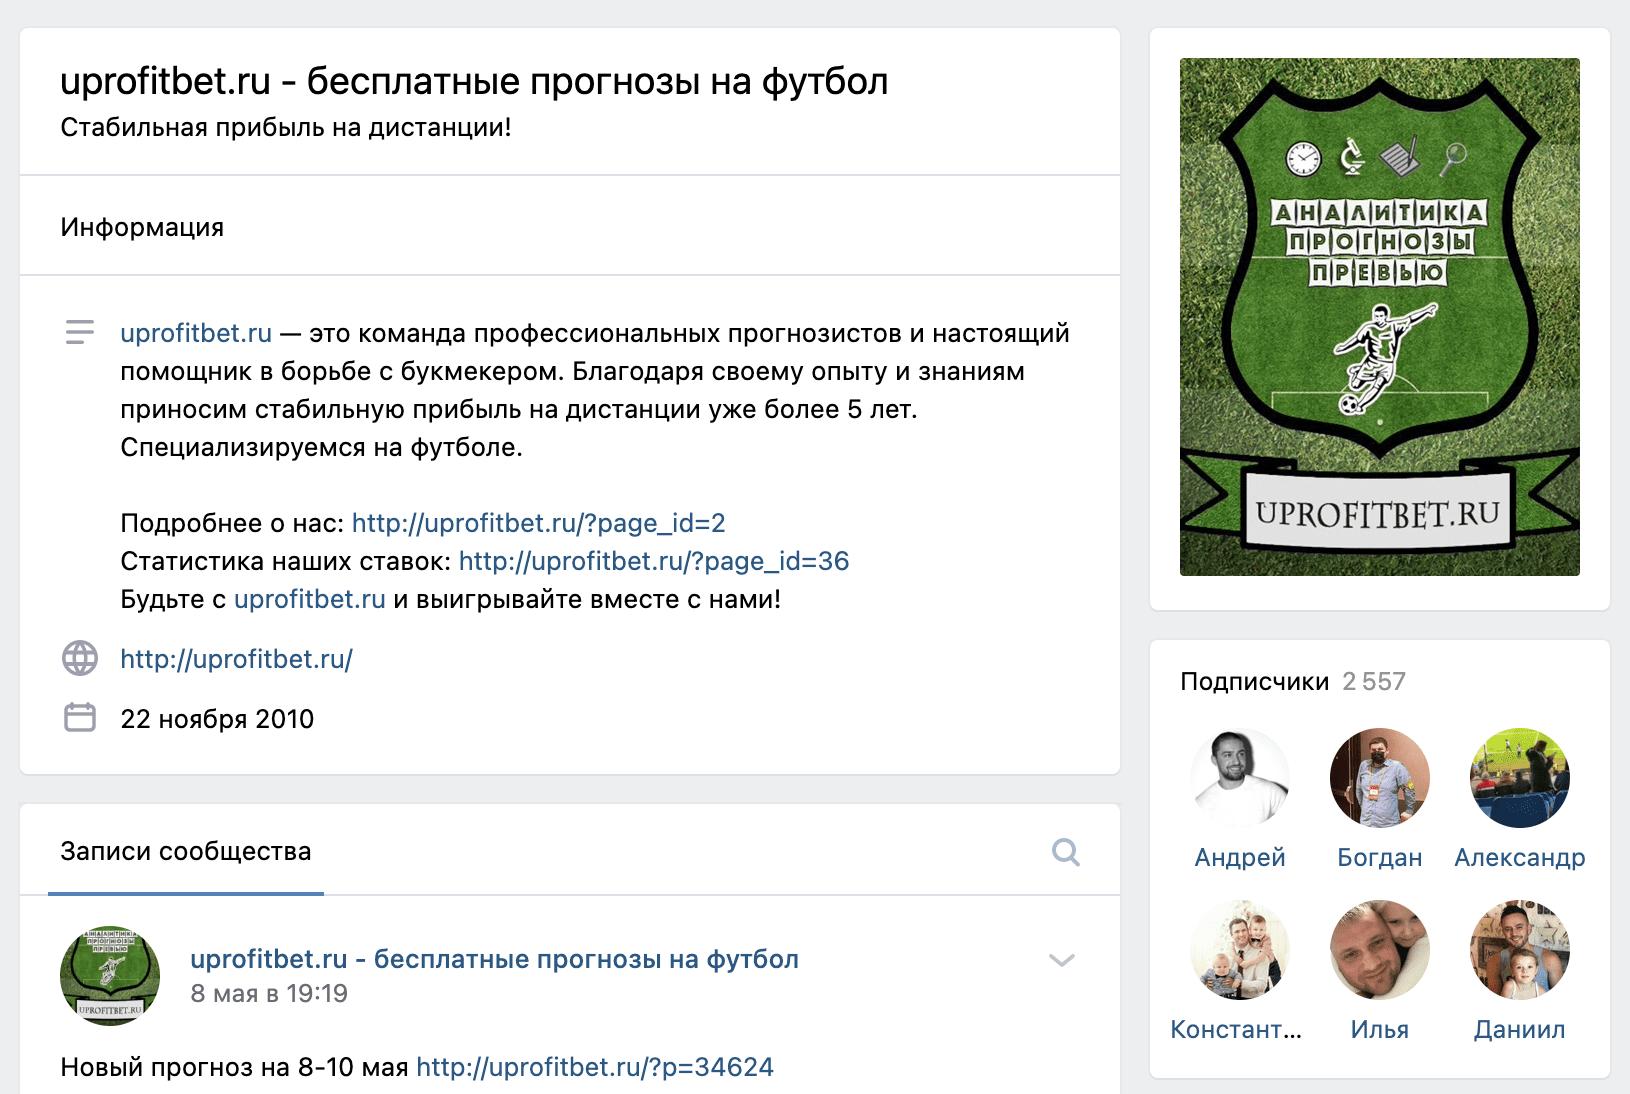 Группа ВК проекта uprofitbet ru